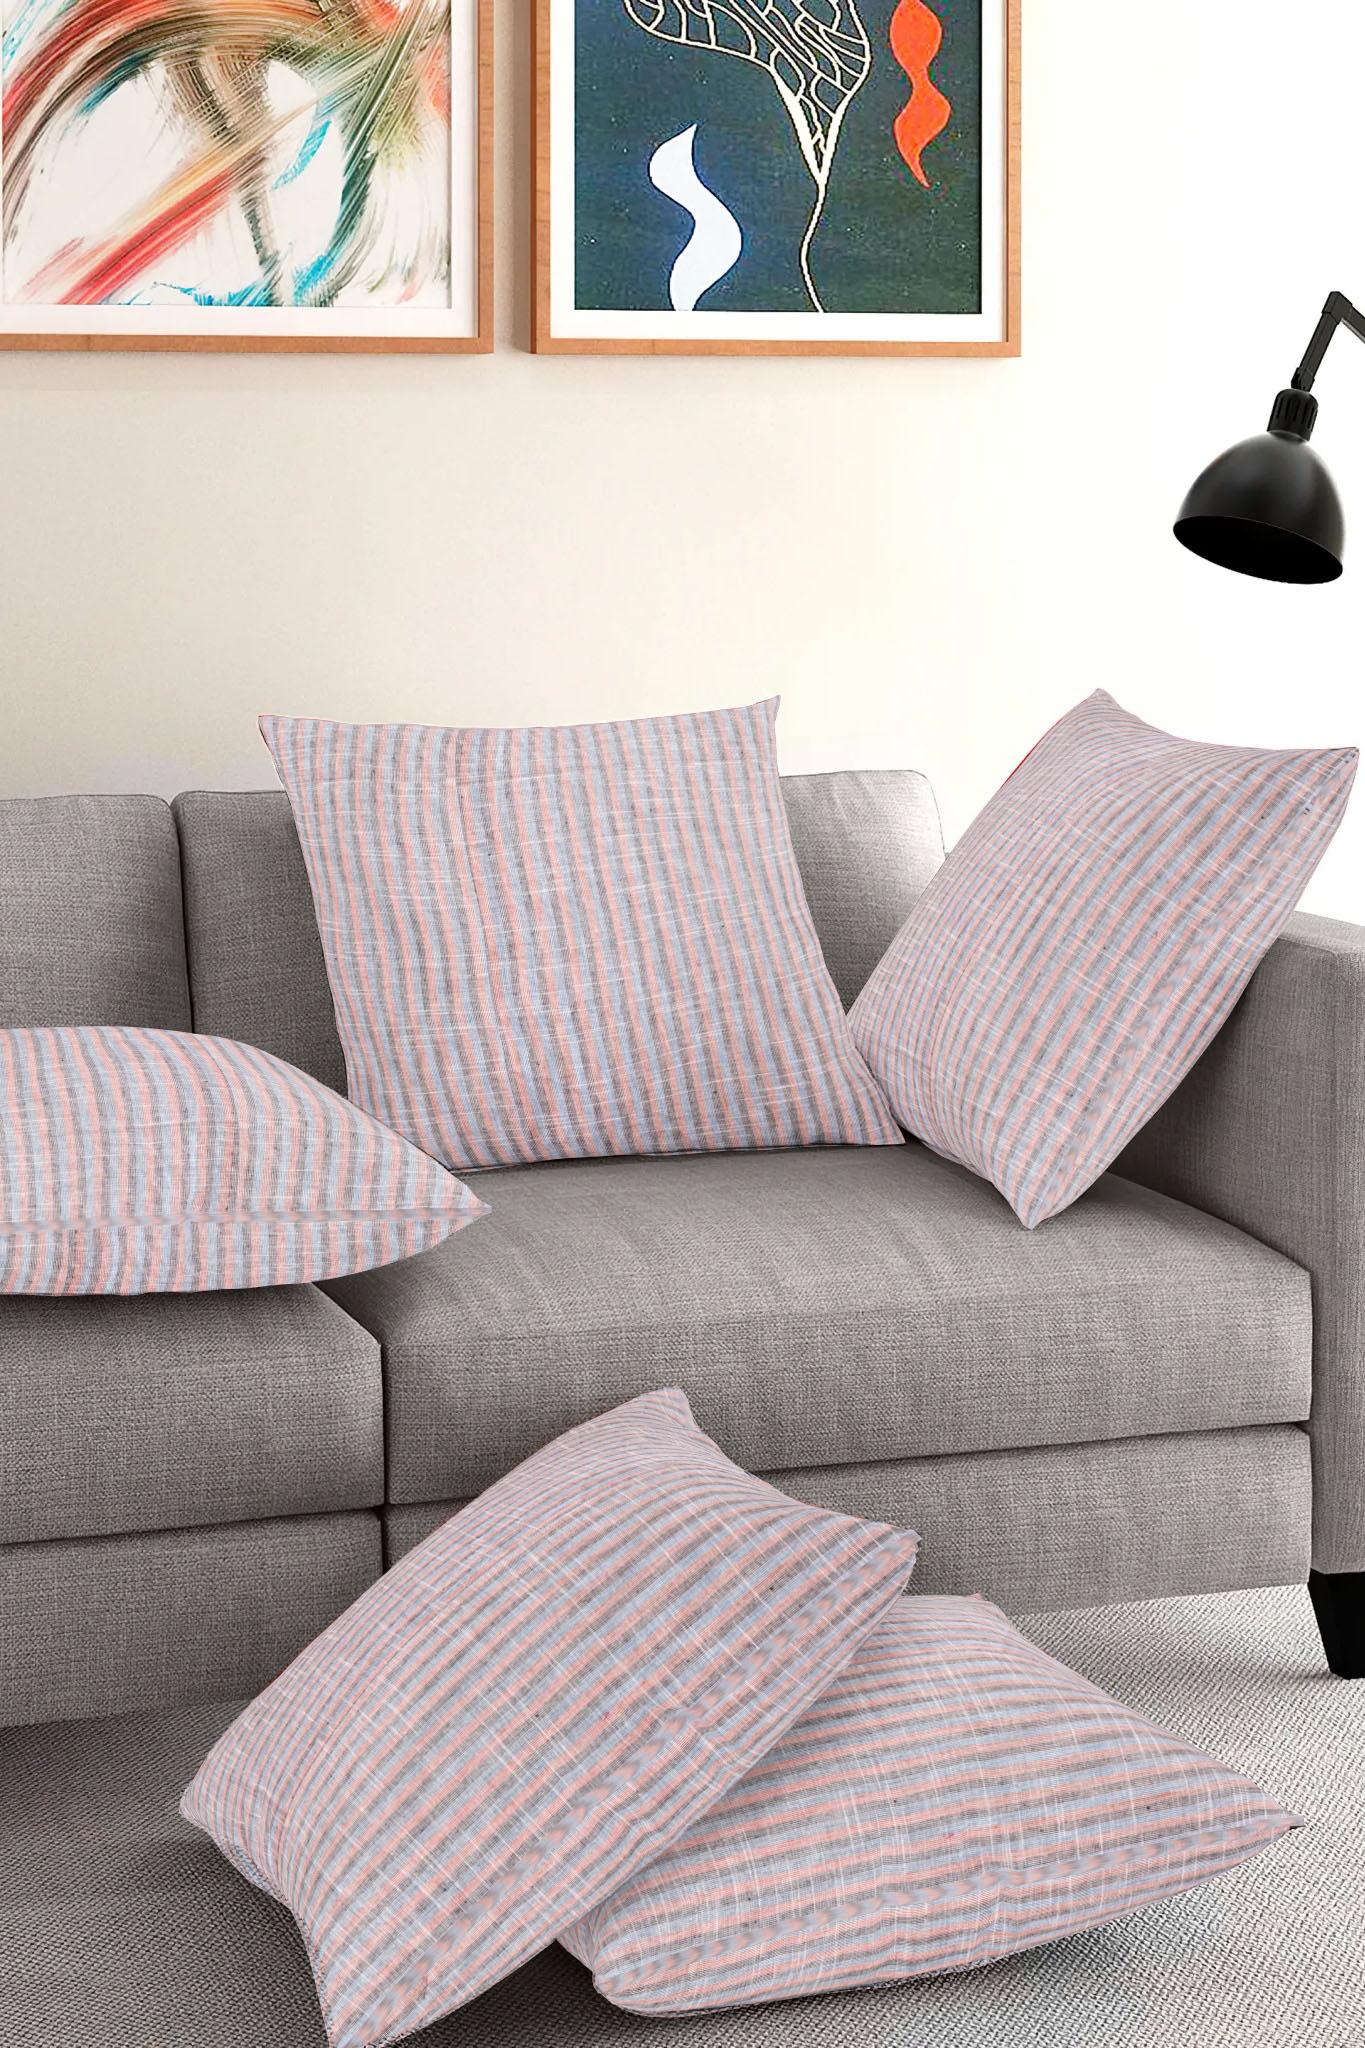 /home/customer/www/fabartcraft.com/public_html/uploadshttps://www.shopolics.com/uploads/images/medium/Gray-Pink-Cotton-Cushion-Cover-35386.jpg